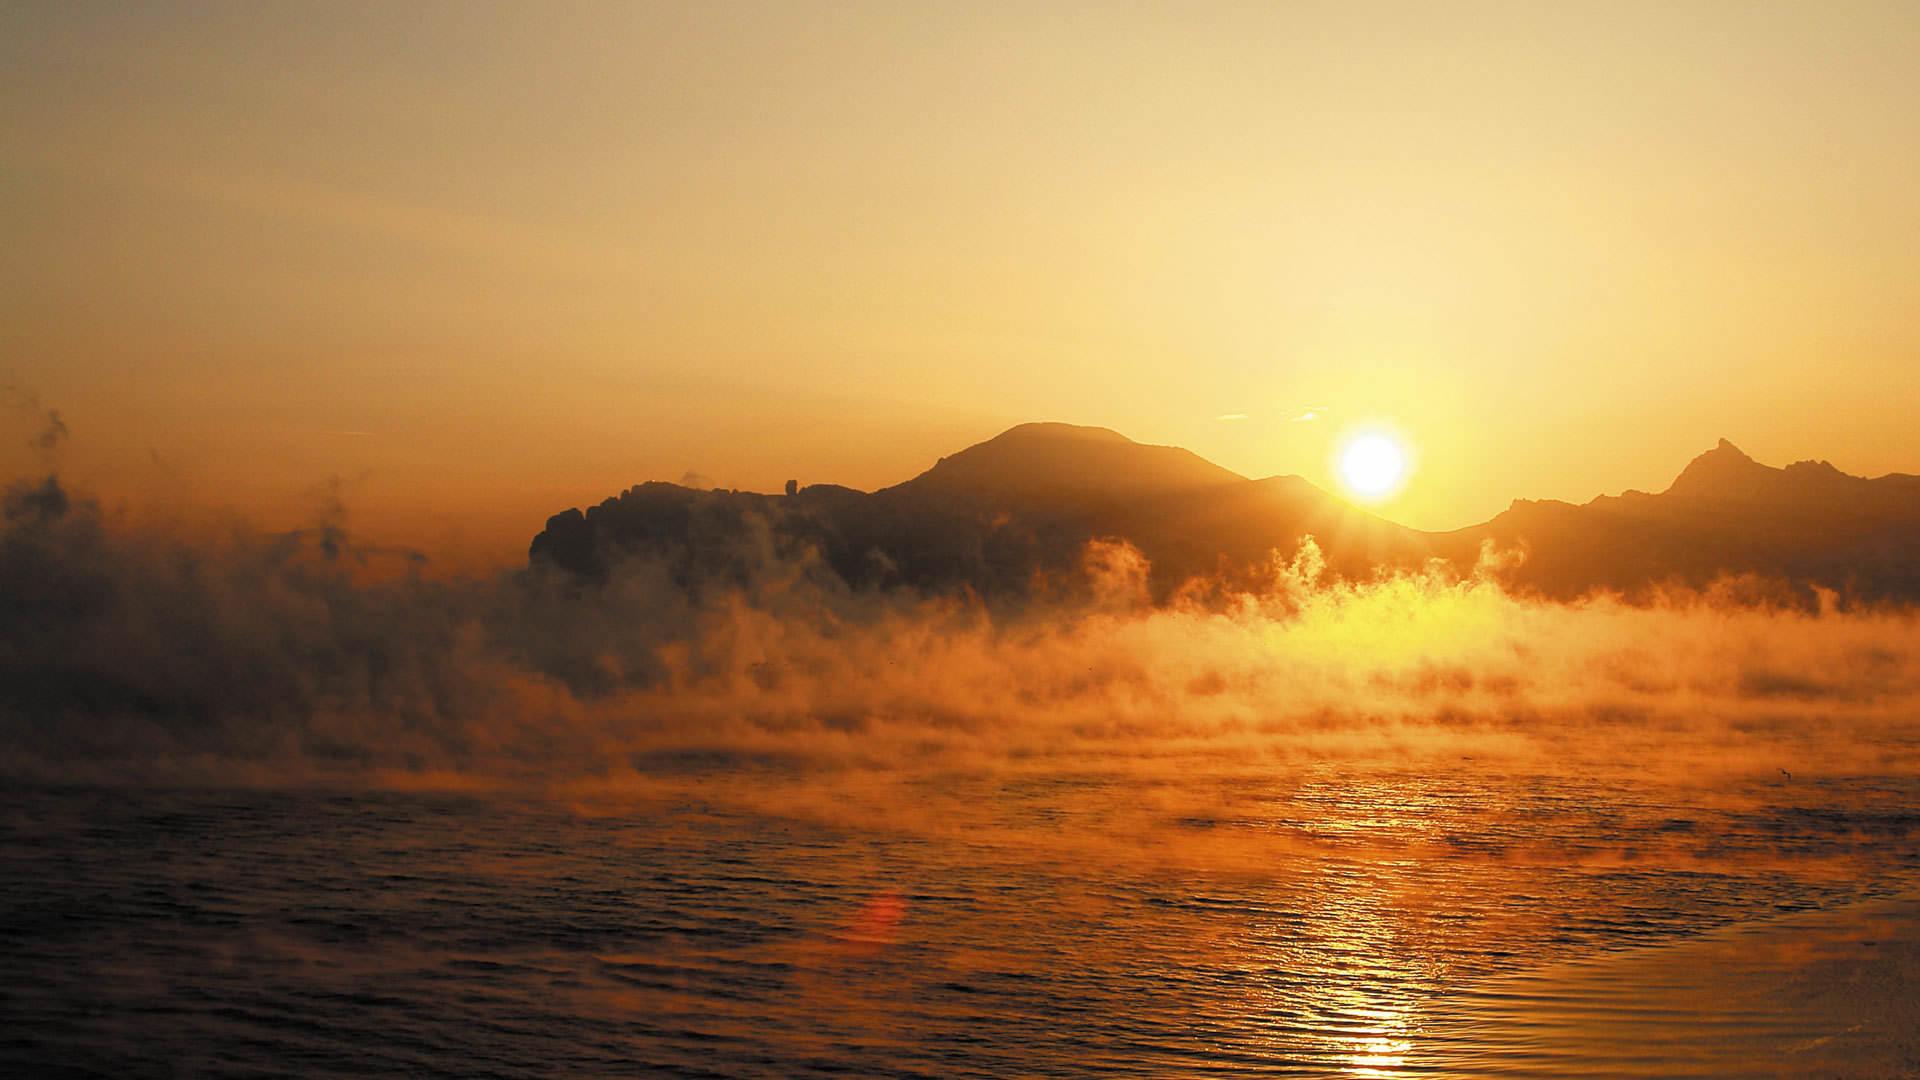 Magnificent Beach Sunrise Wallpaper